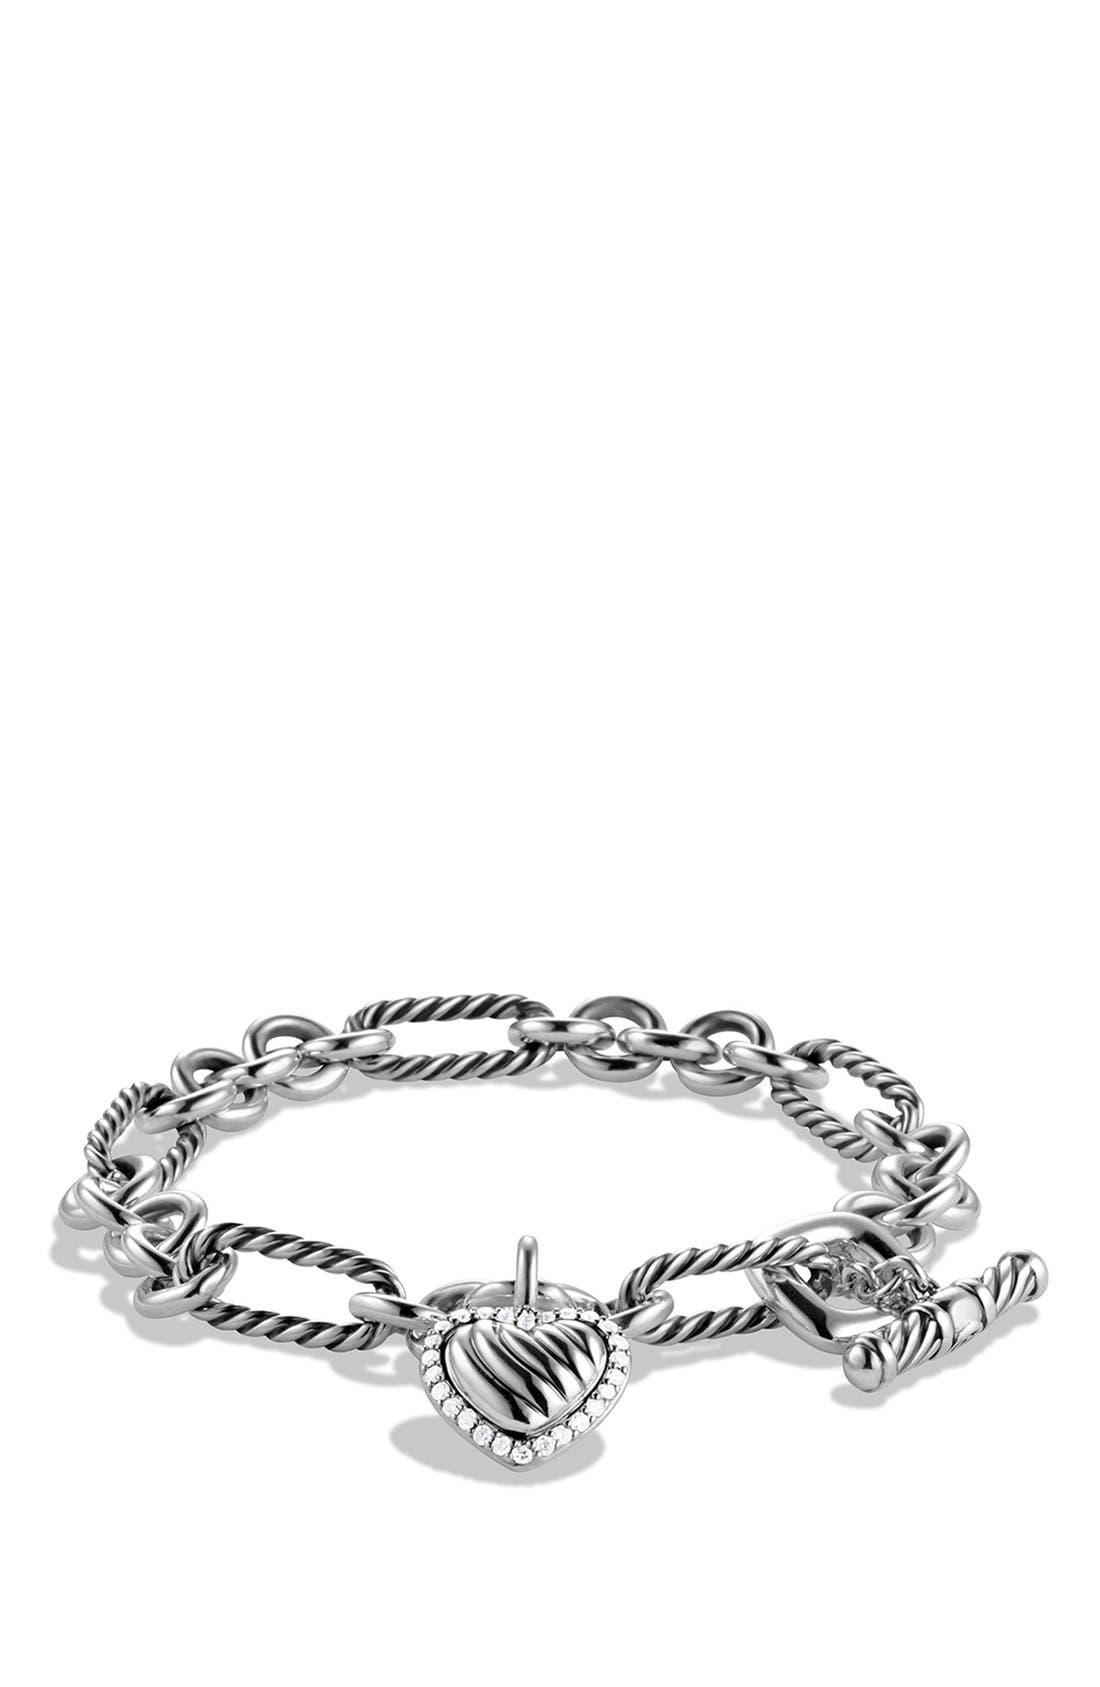 Alternate Image 1 Selected - David Yurman 'Cable Heart' Charm Bracelet with Diamonds